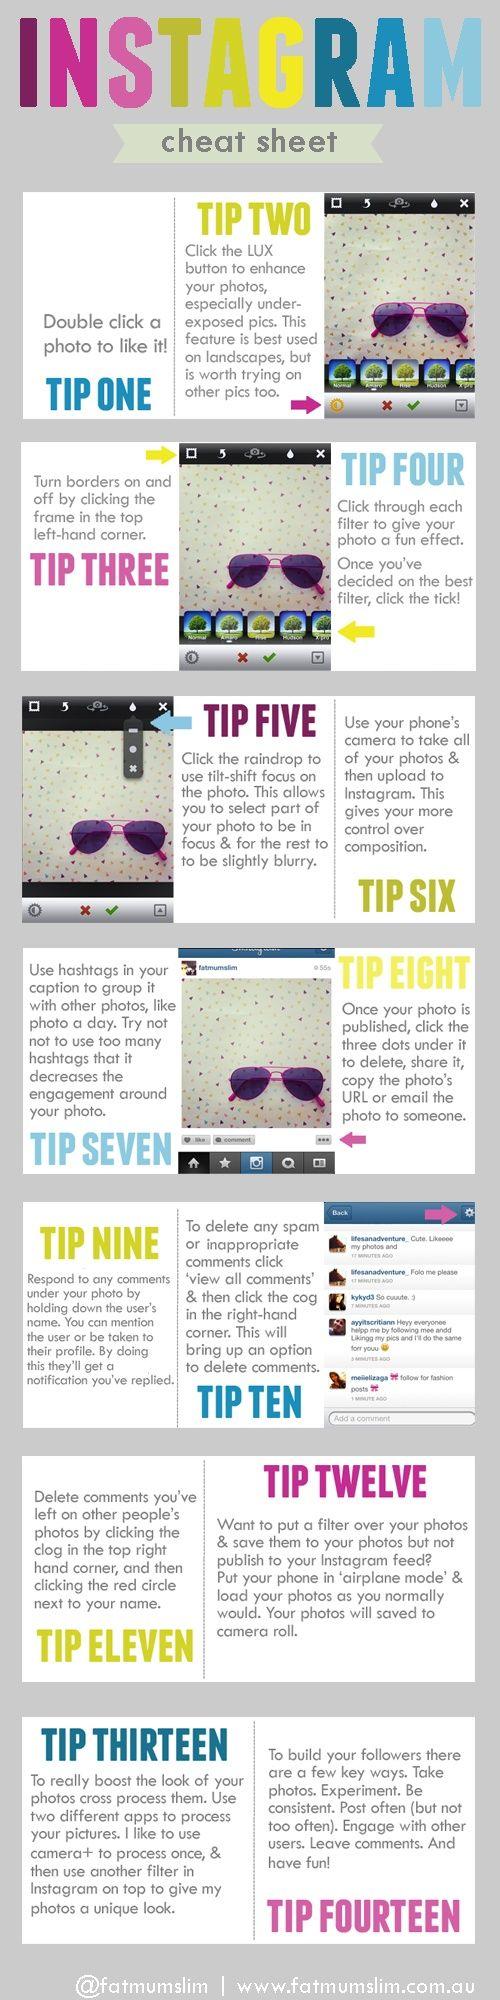 Instagram cheat sheet #infographic